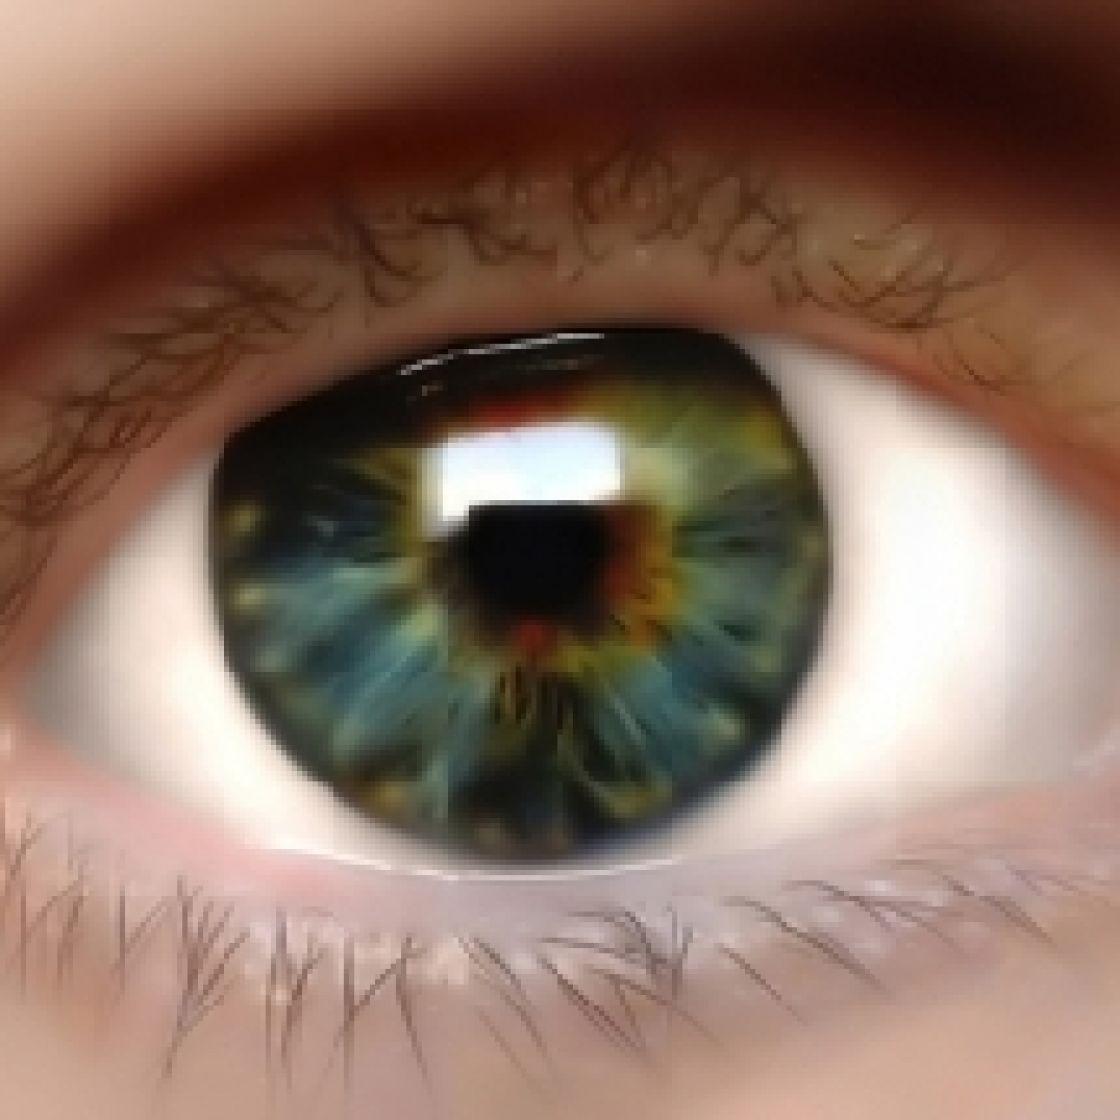 Peripapillary detachment in pathologic myopia: unusual findings